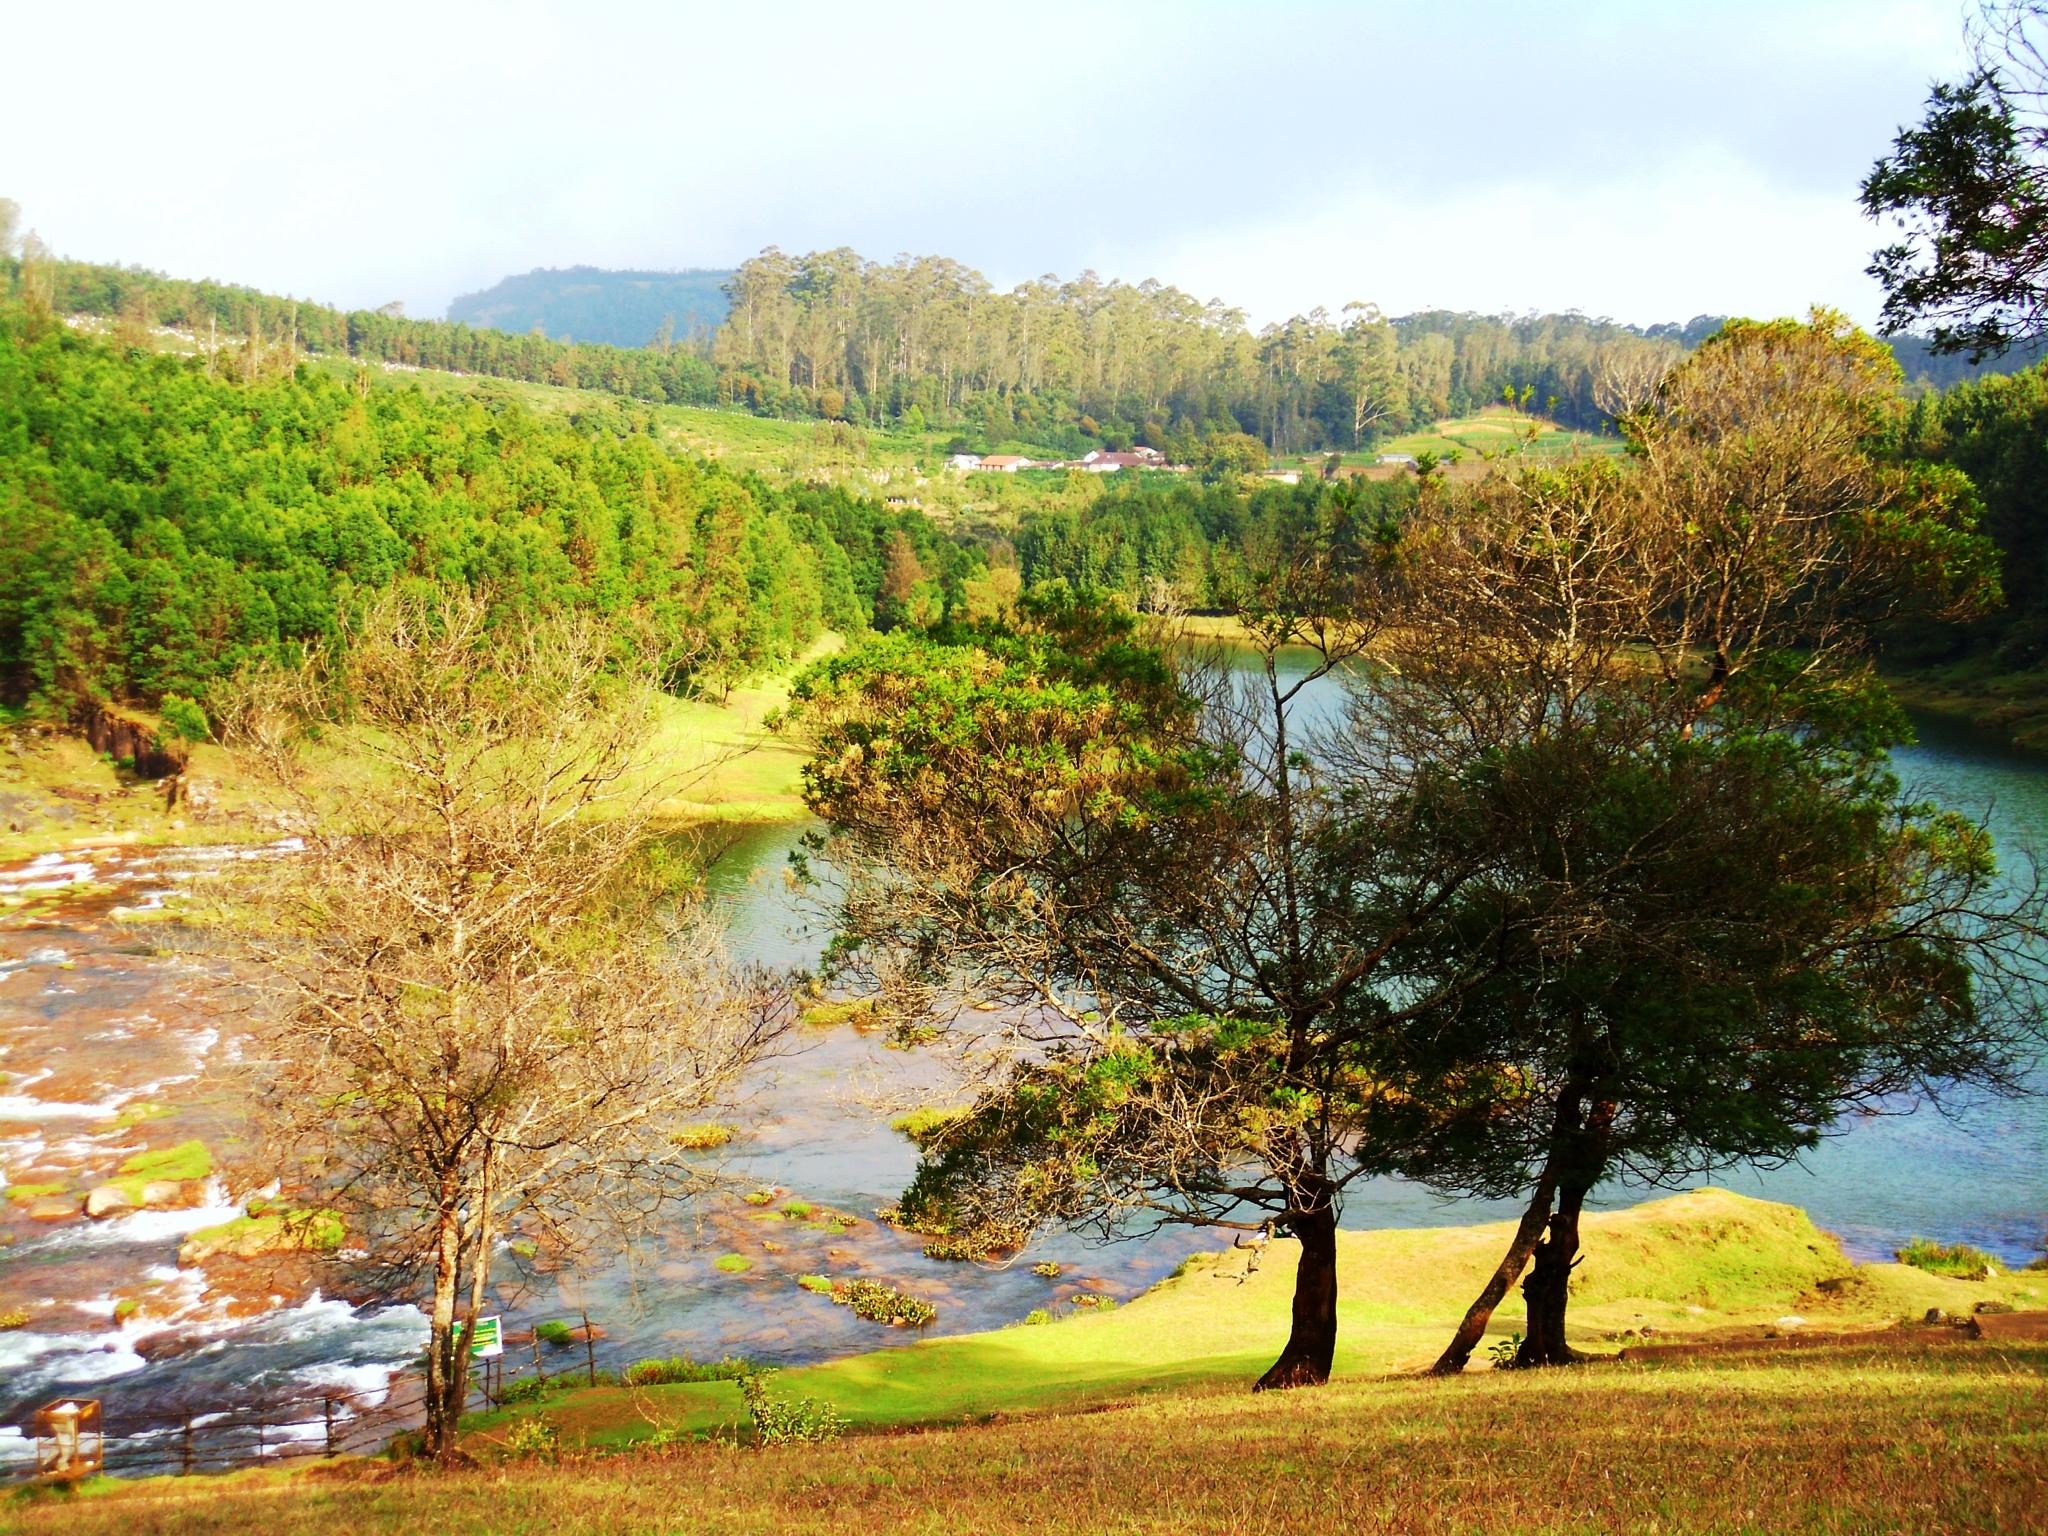 Landscape by Roy cliffer